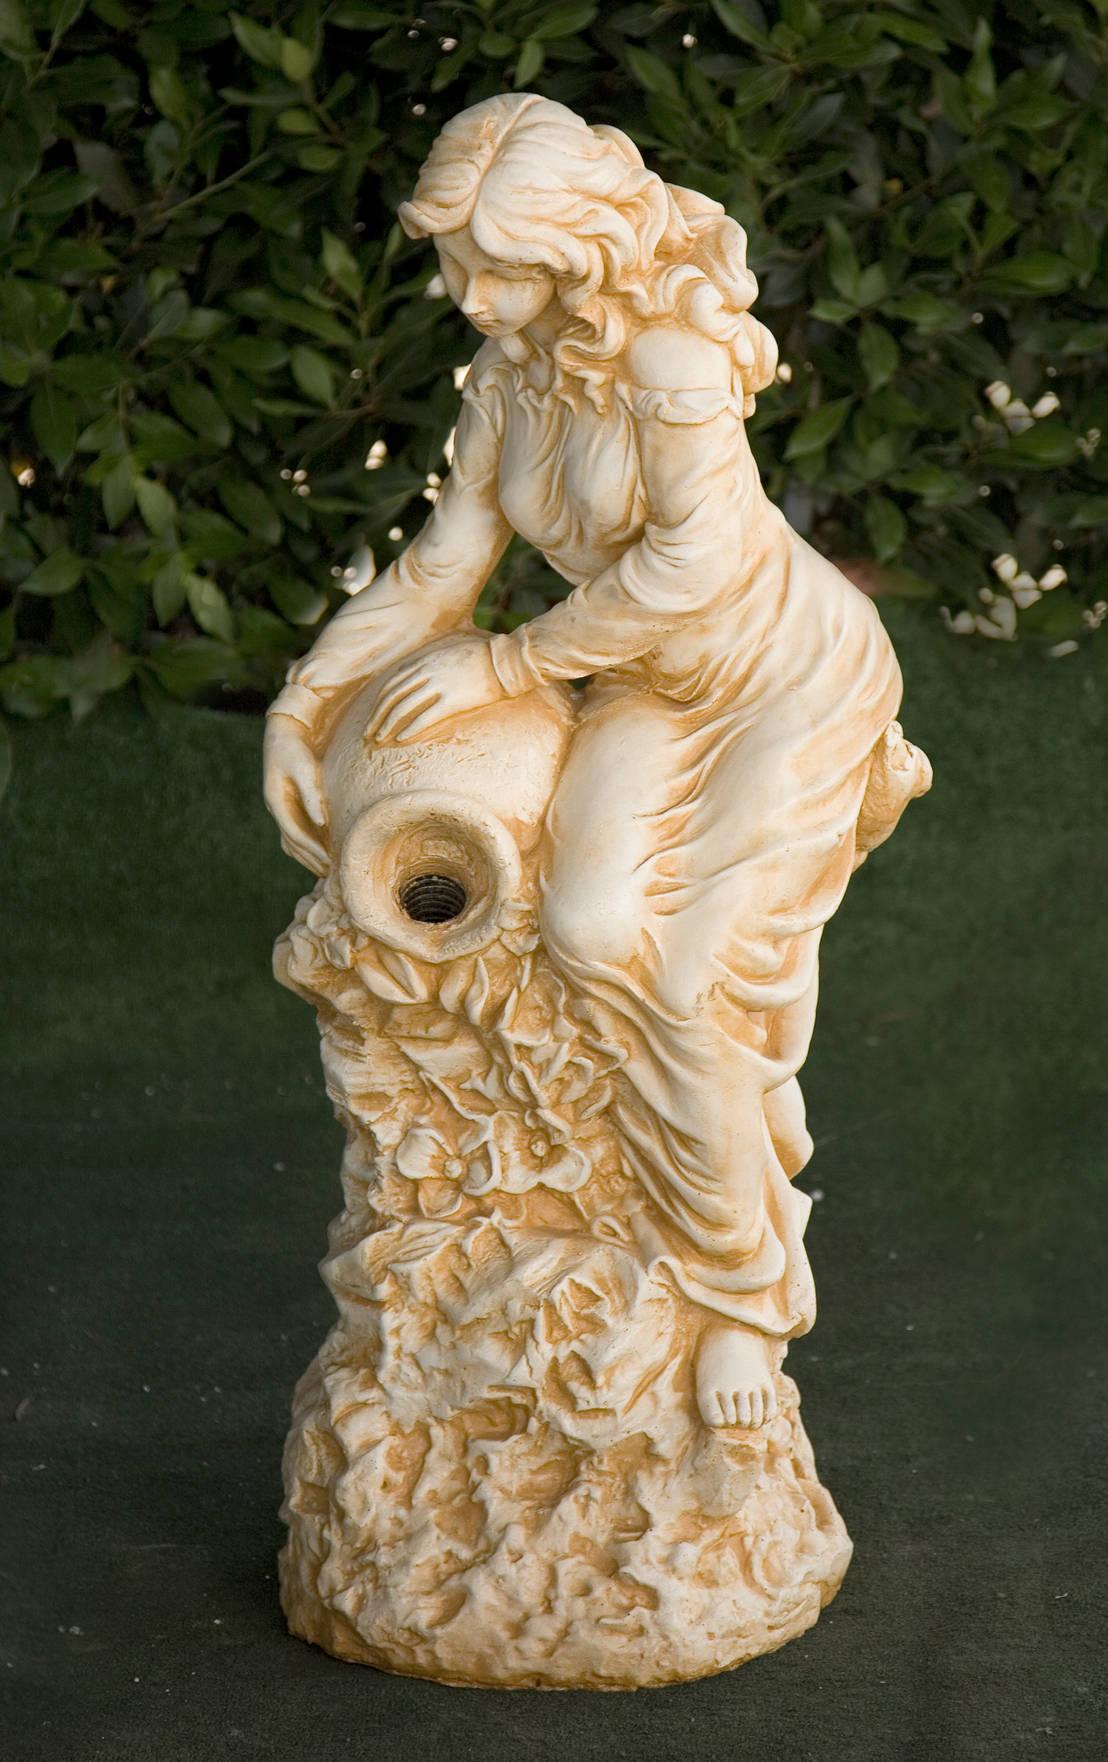 Figuras decorativas de jard n de ana parra homify for Figuras decorativas para jardin